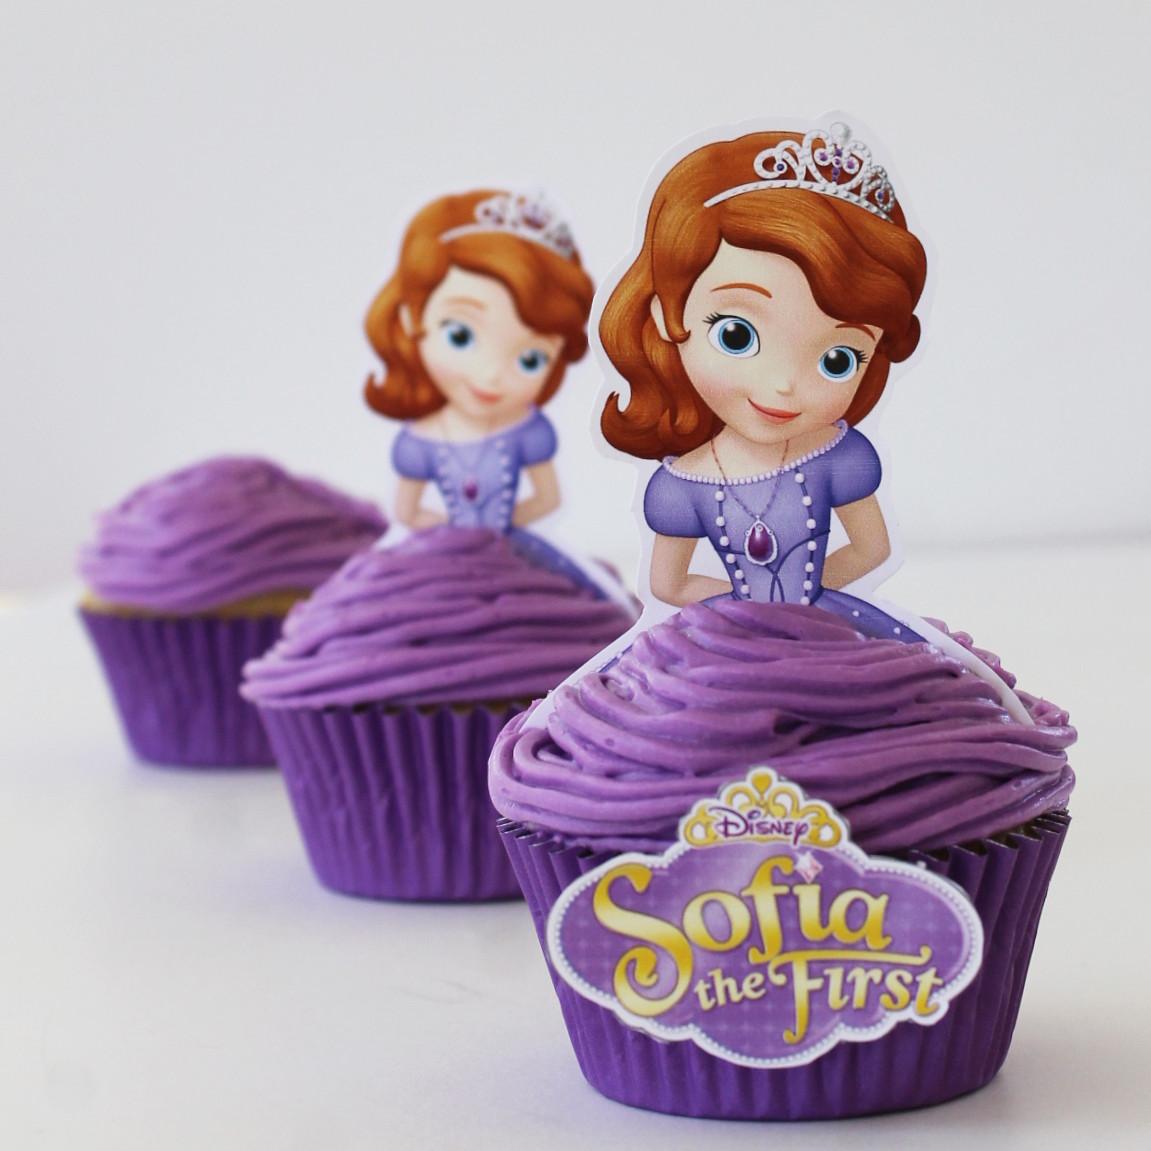 Sofia The First Princess Blueberry Cupcakes